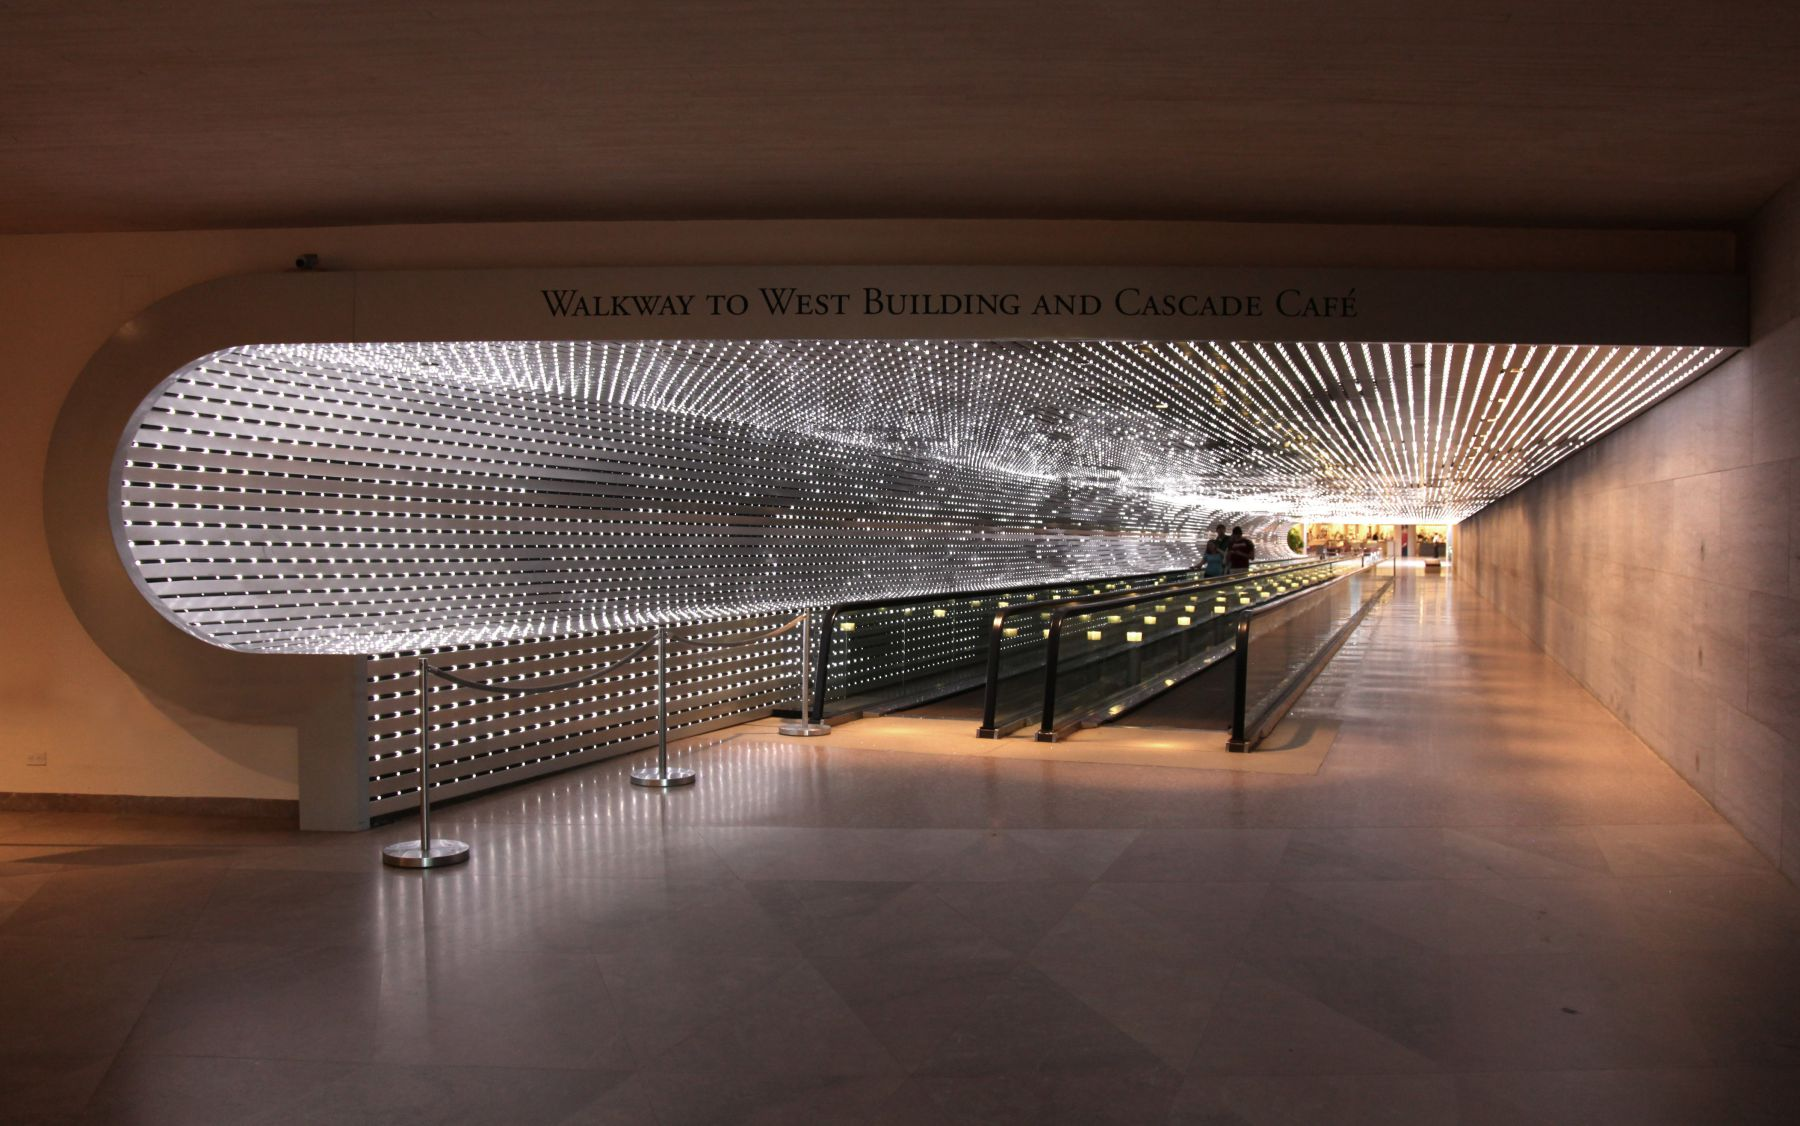 LEO VILLAREAL  Multiverse 2005-2008. Permanent installation: National Gallery of Art, Washington, DC.